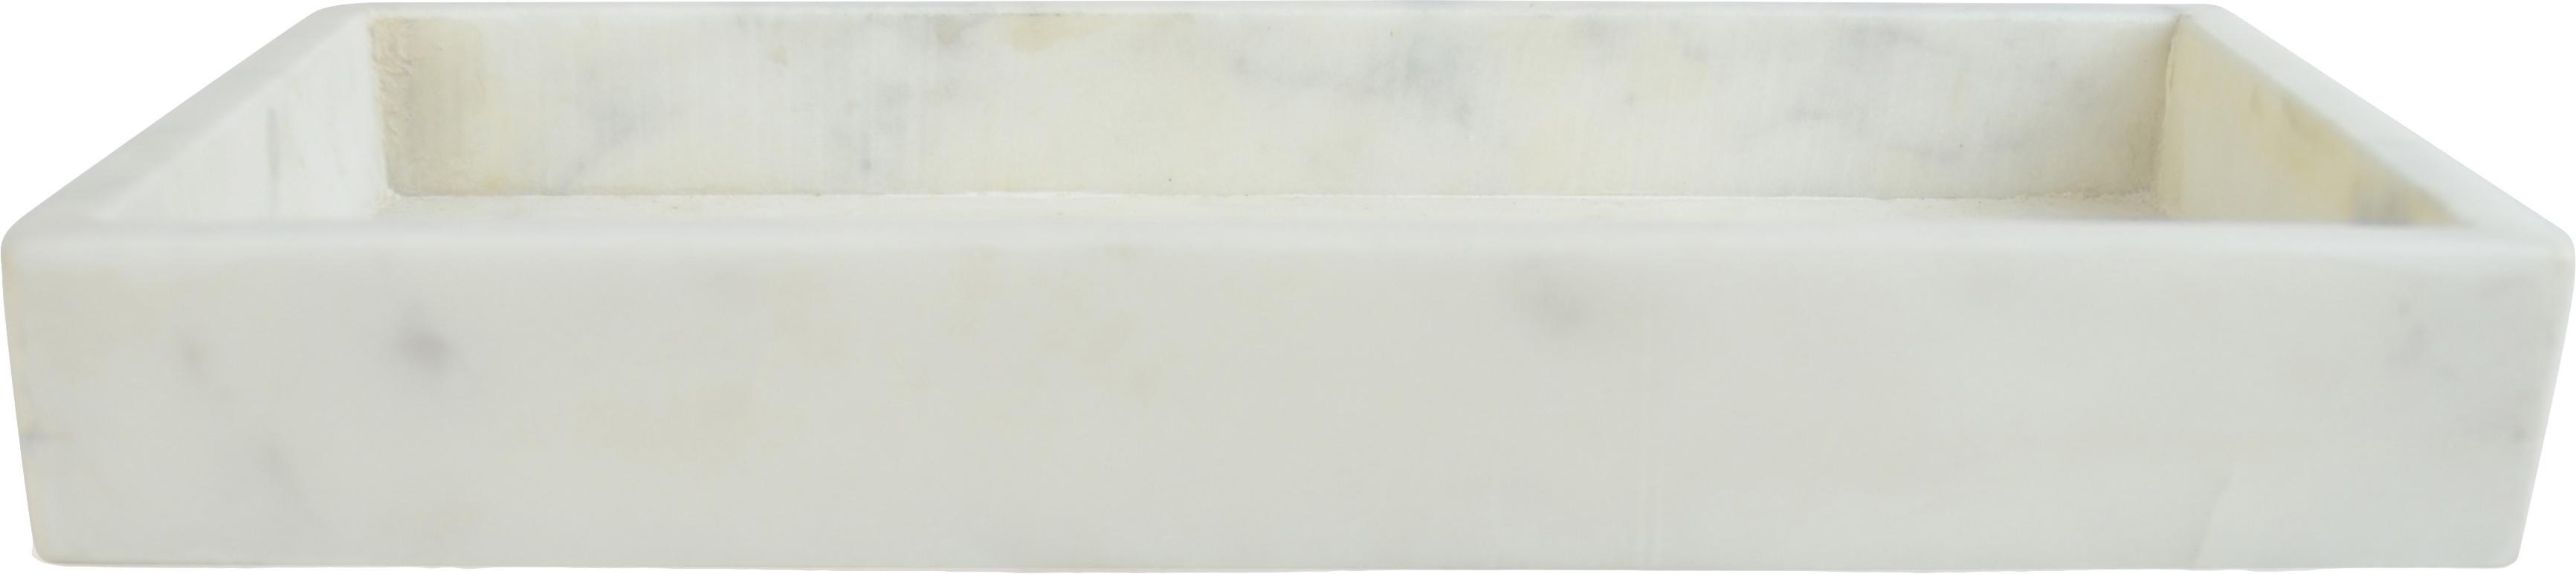 Deko-Marmor-Tablett Mera, Marmor, Weiss, marmoriert, B 30 x T 15 cm